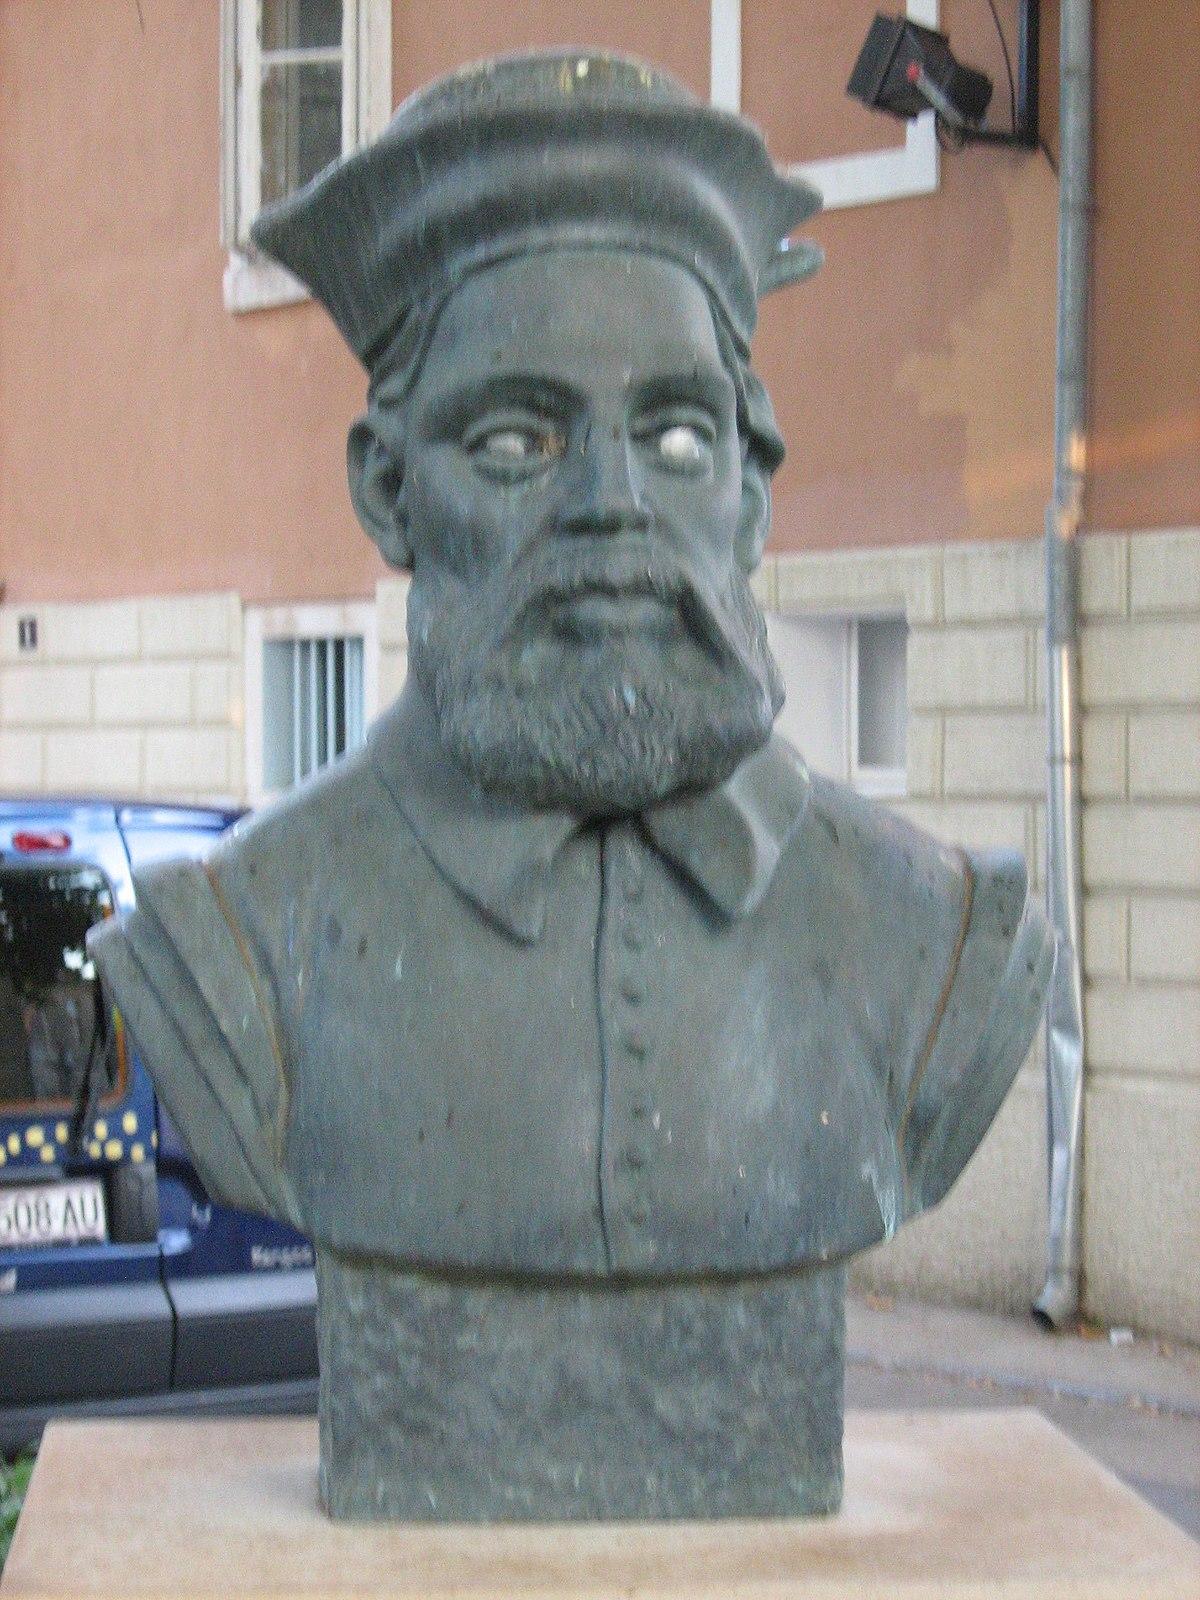 Datoteka Andrija Medulic Zadar Jpg Wikipedija